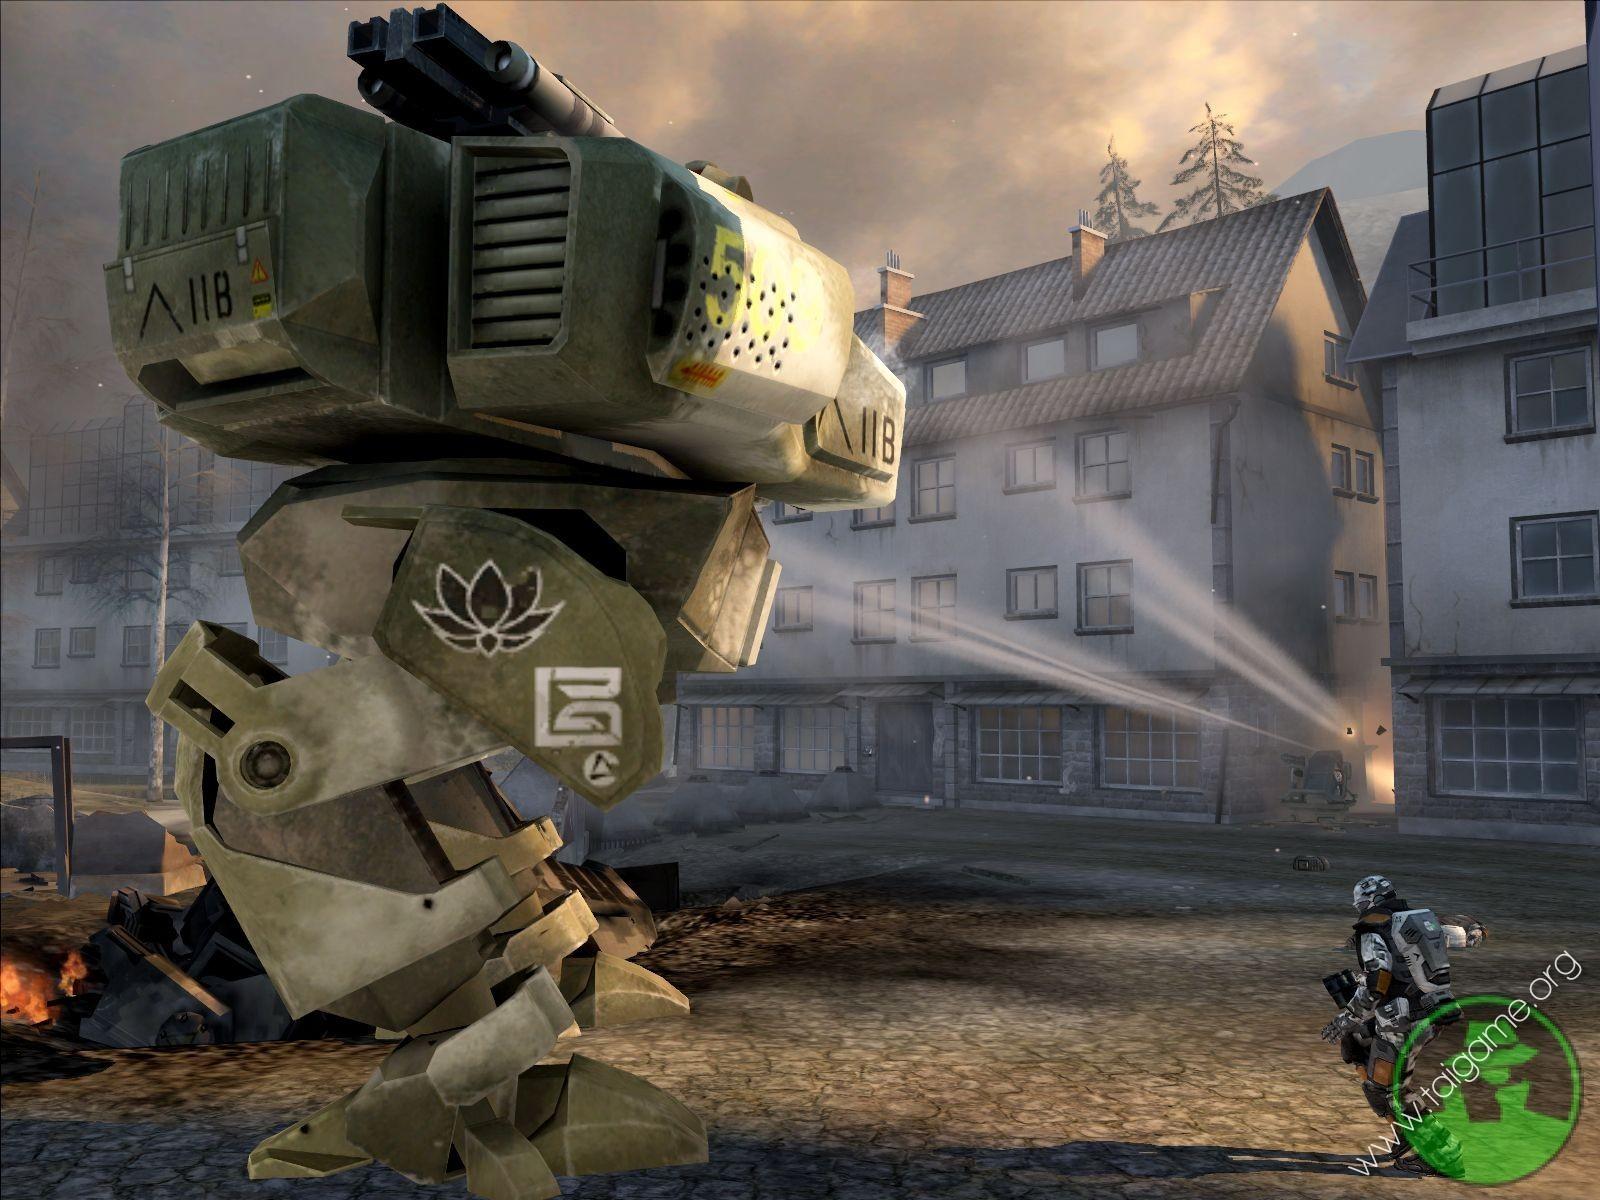 Battlefield 2142 - Download Free Full Games   Arcade ...